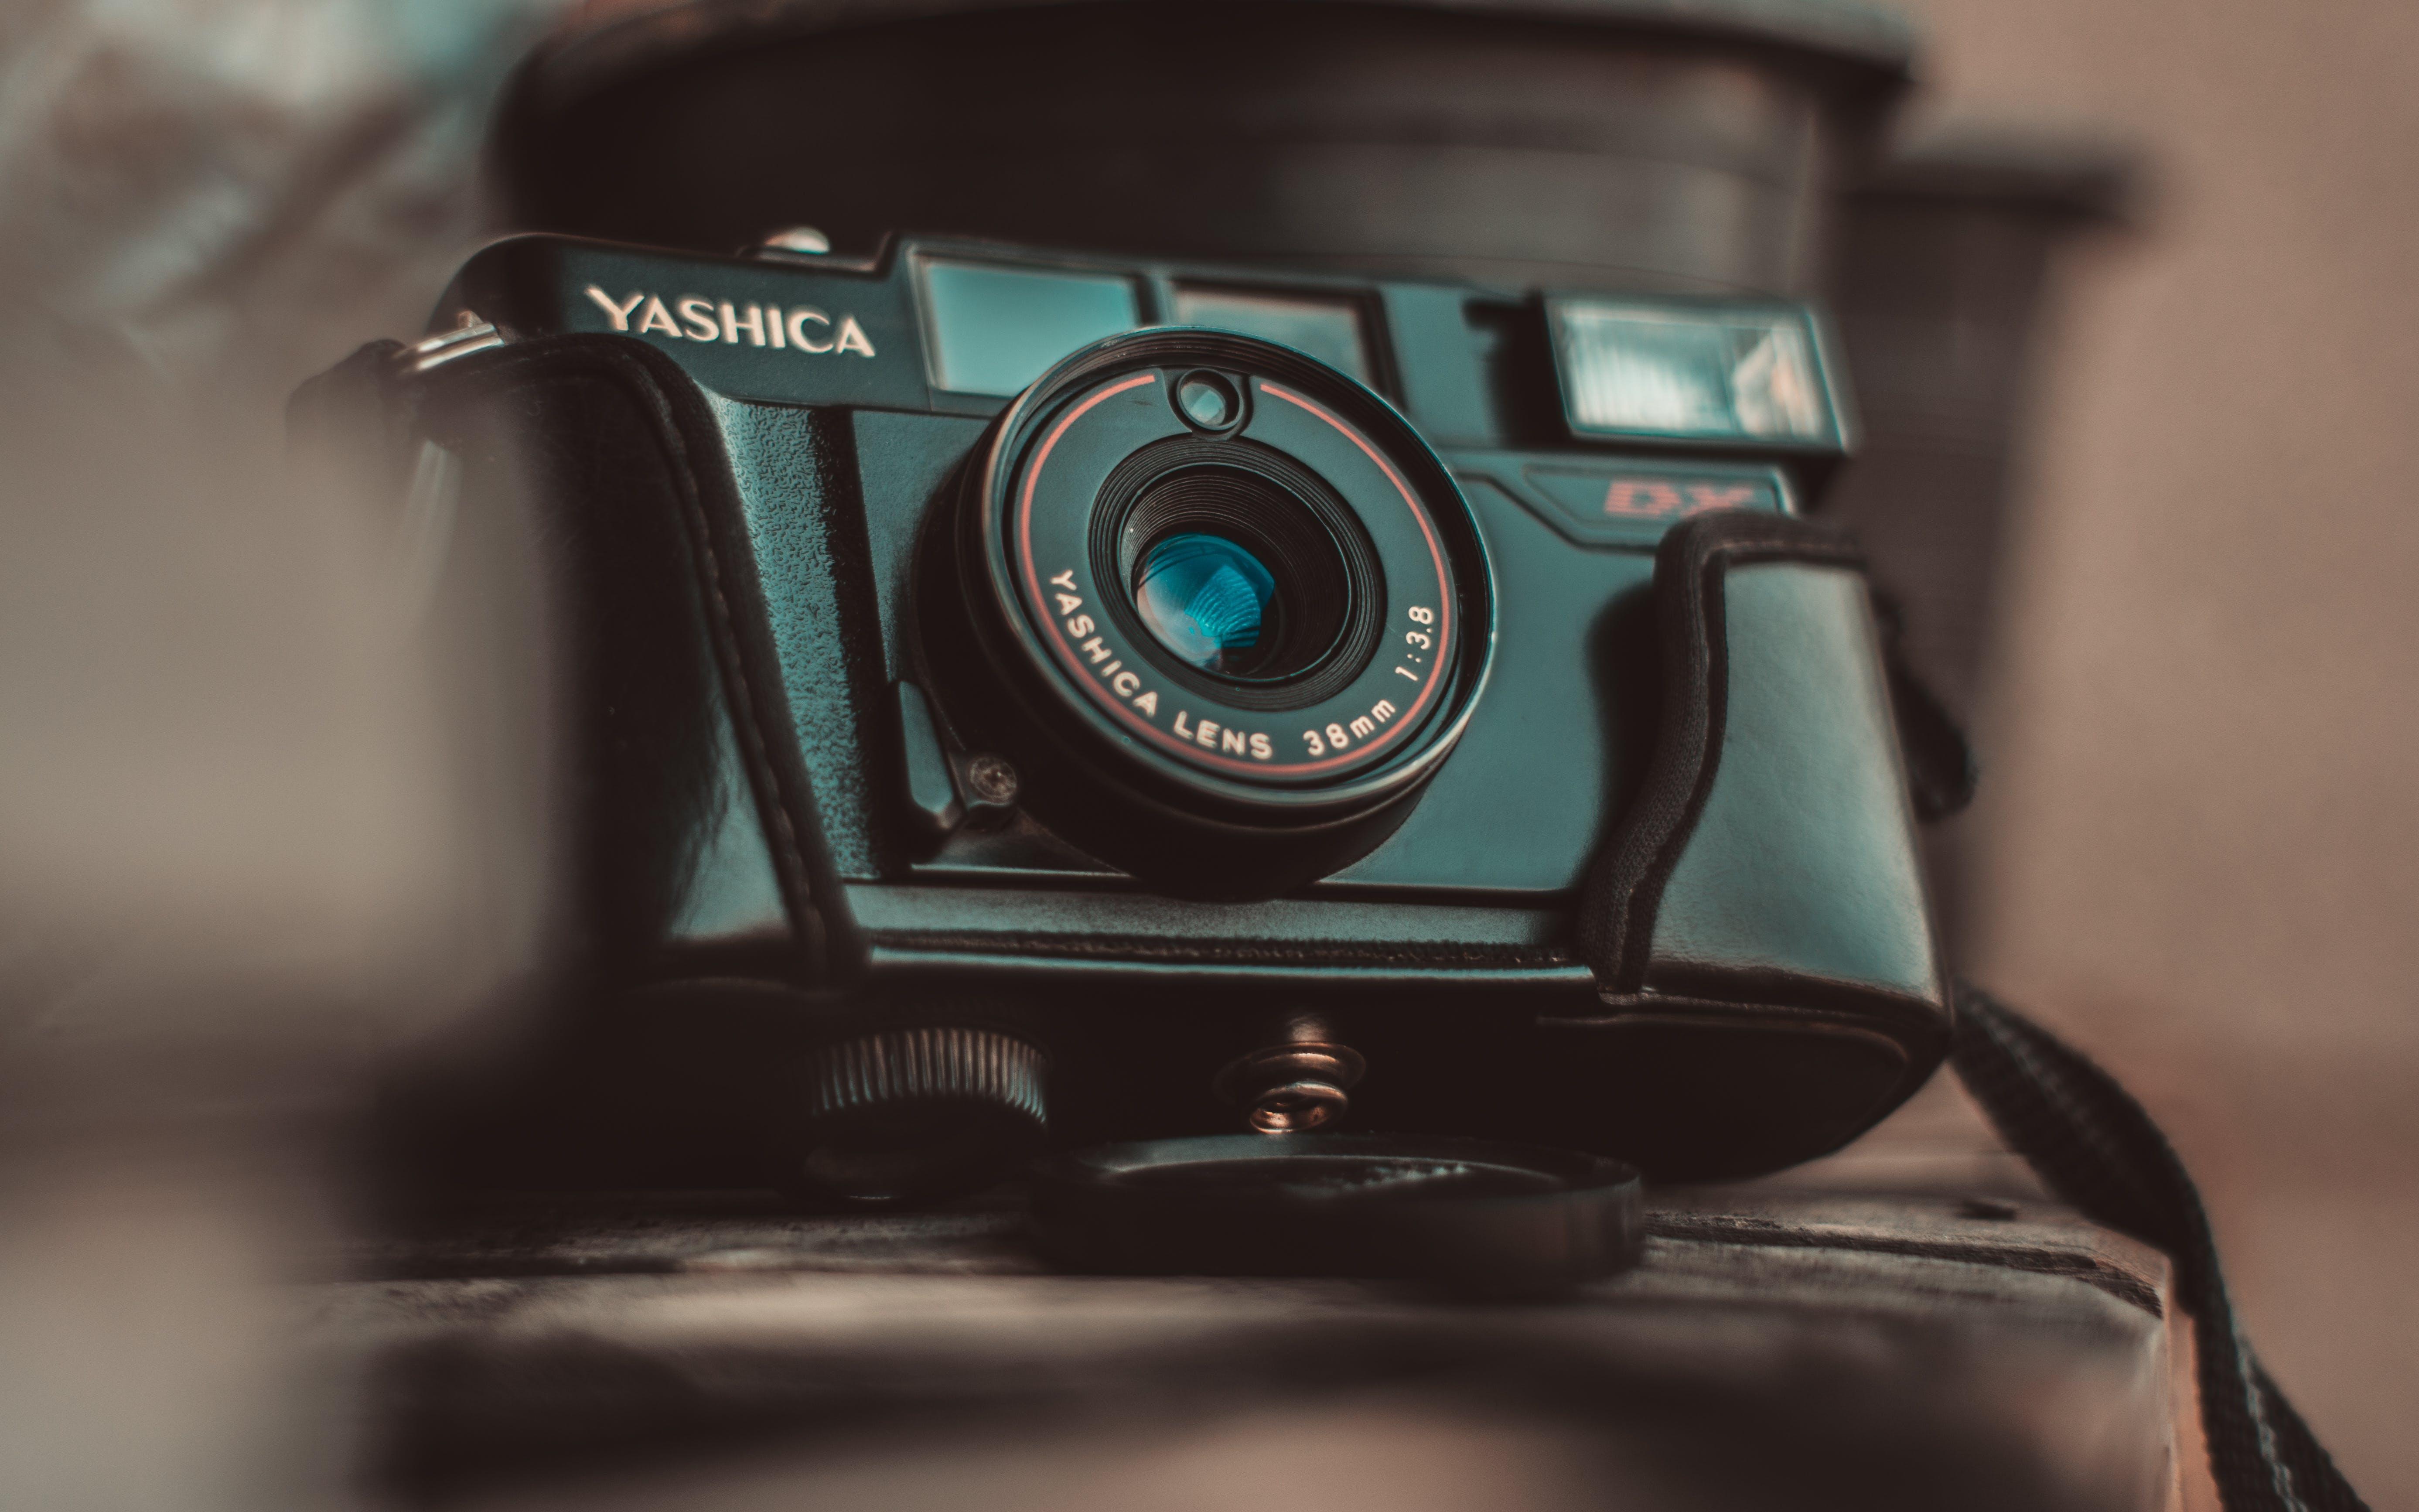 Gratis stockfoto met camera, klassiek, Yashica